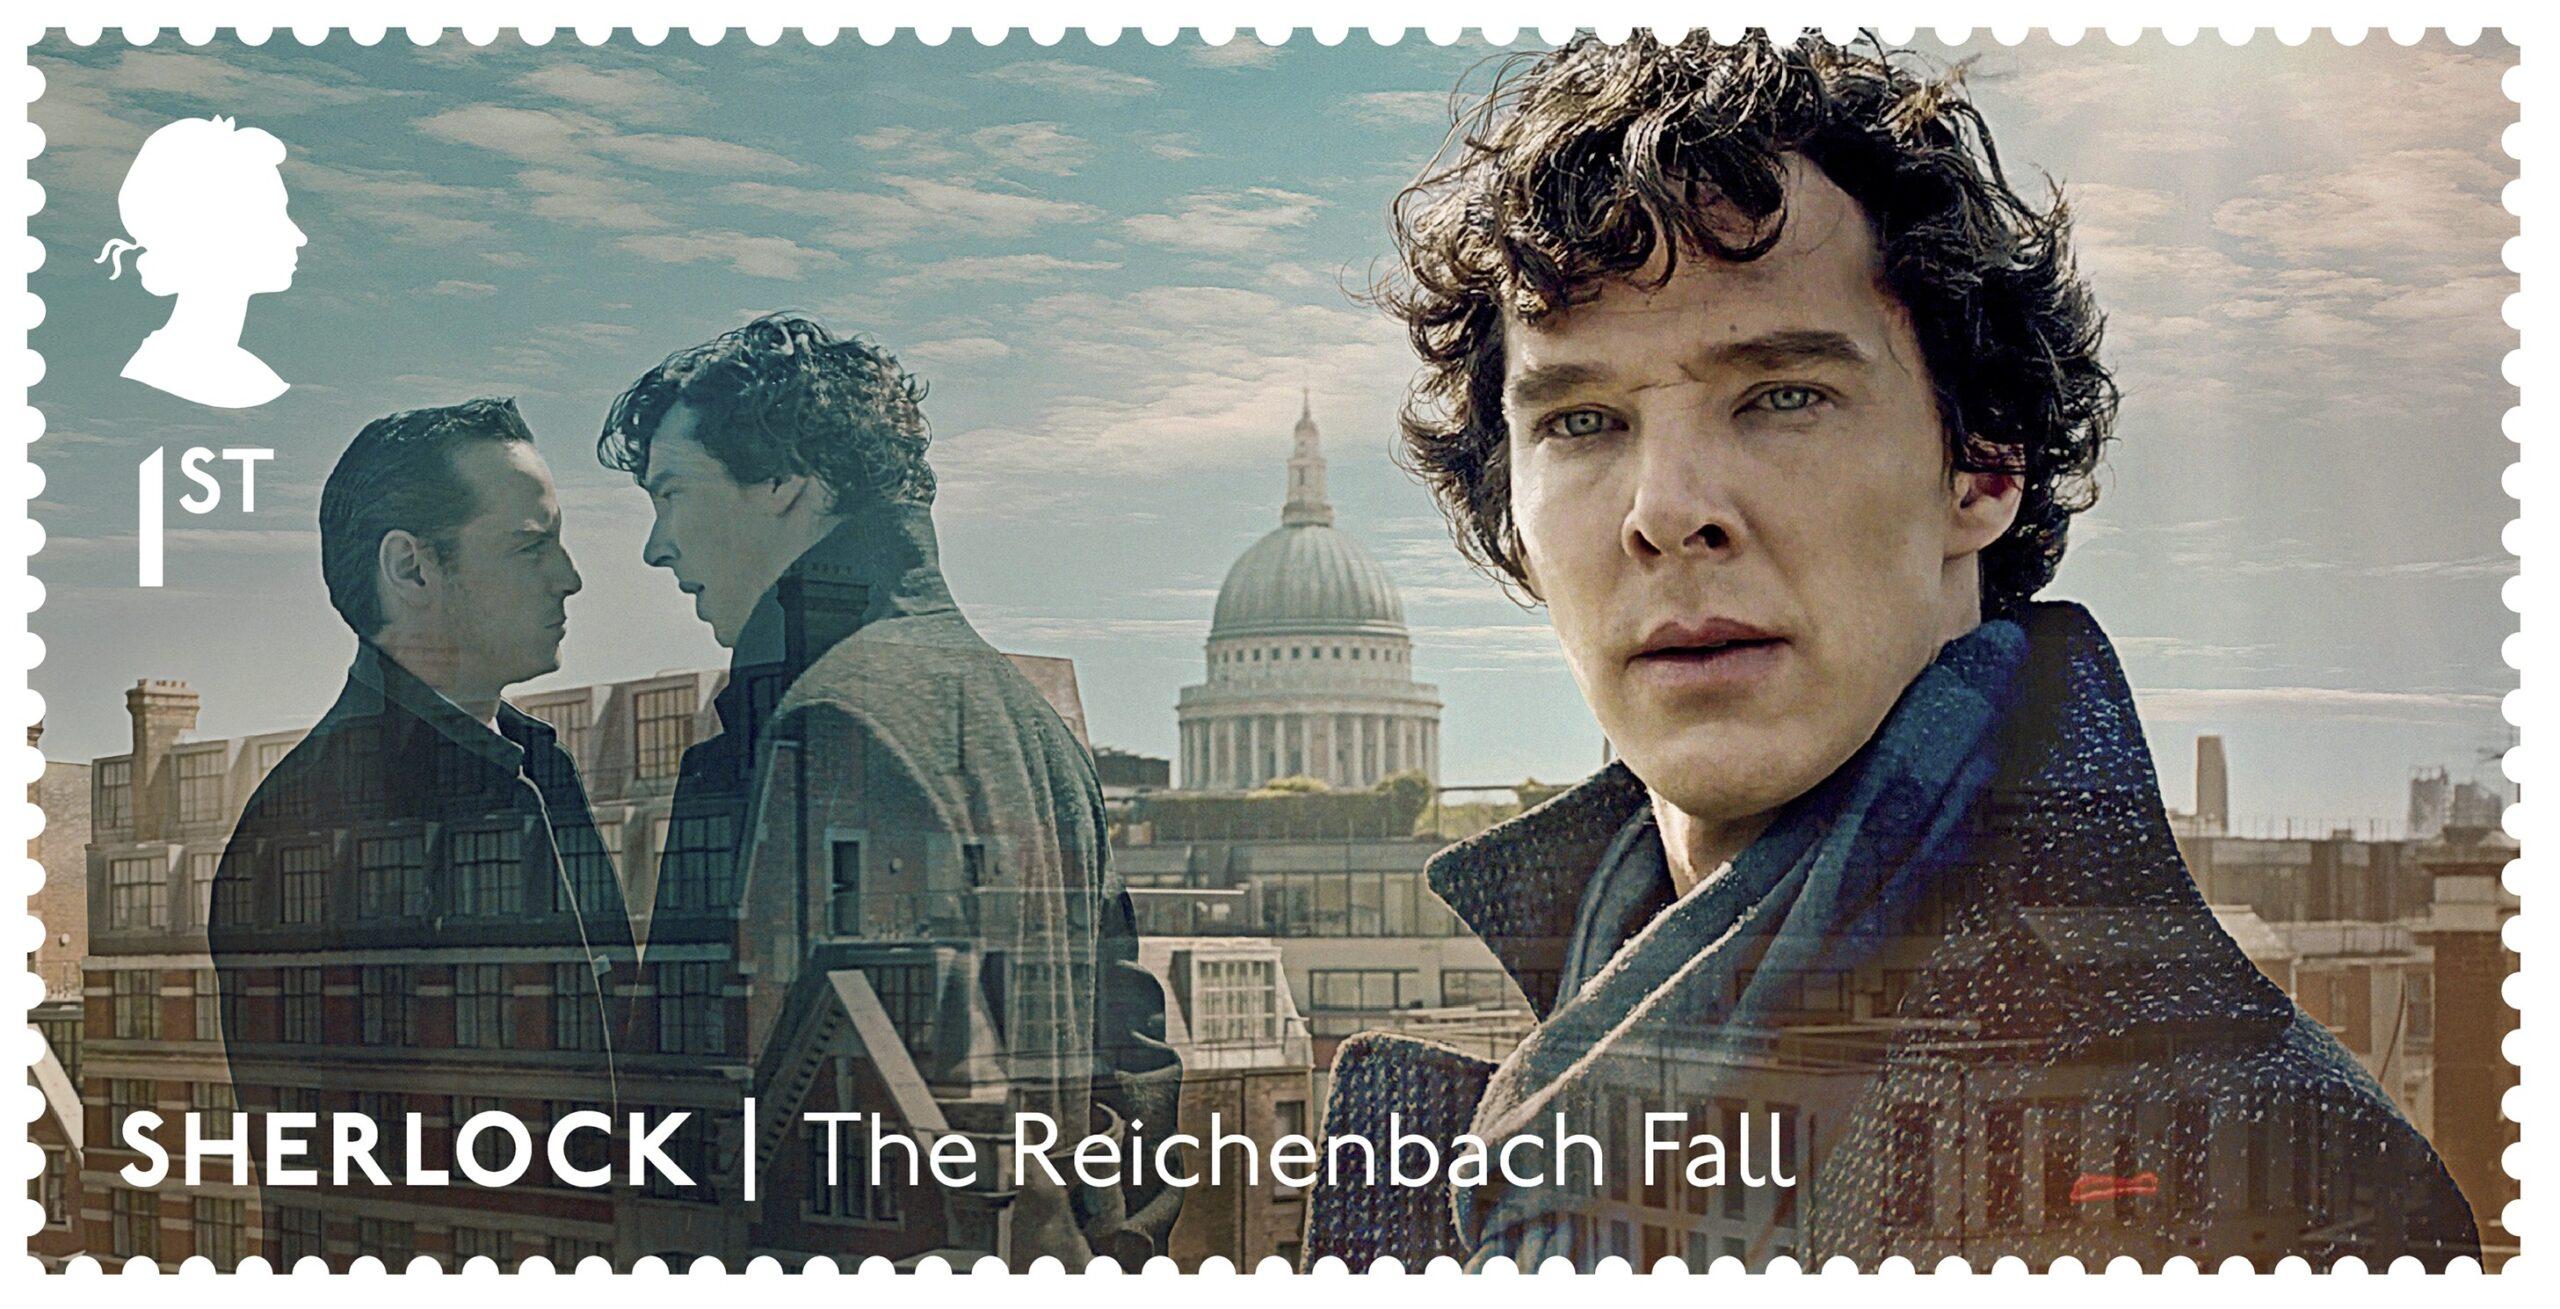 Royal Mint & Royal Mail Collaborate on Sherlockian Philatelic – Numismatic Covers